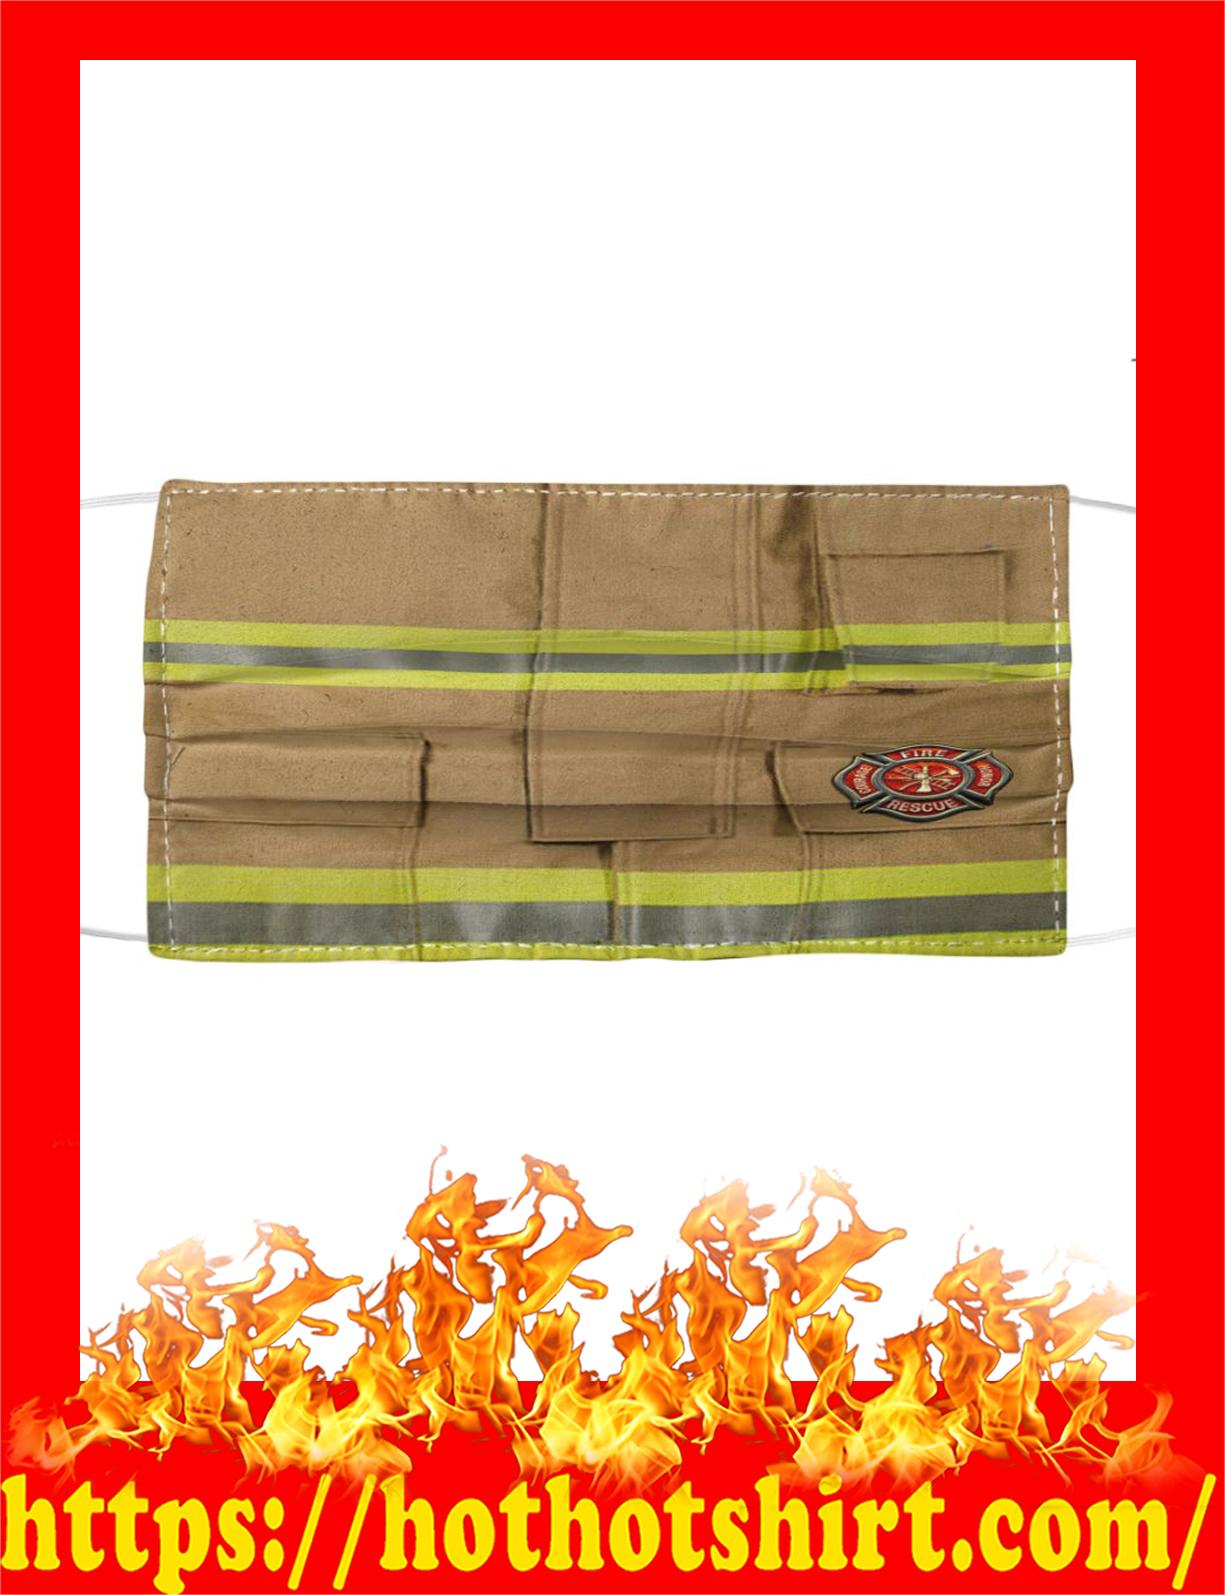 Firefighter uniforms face mask - detail